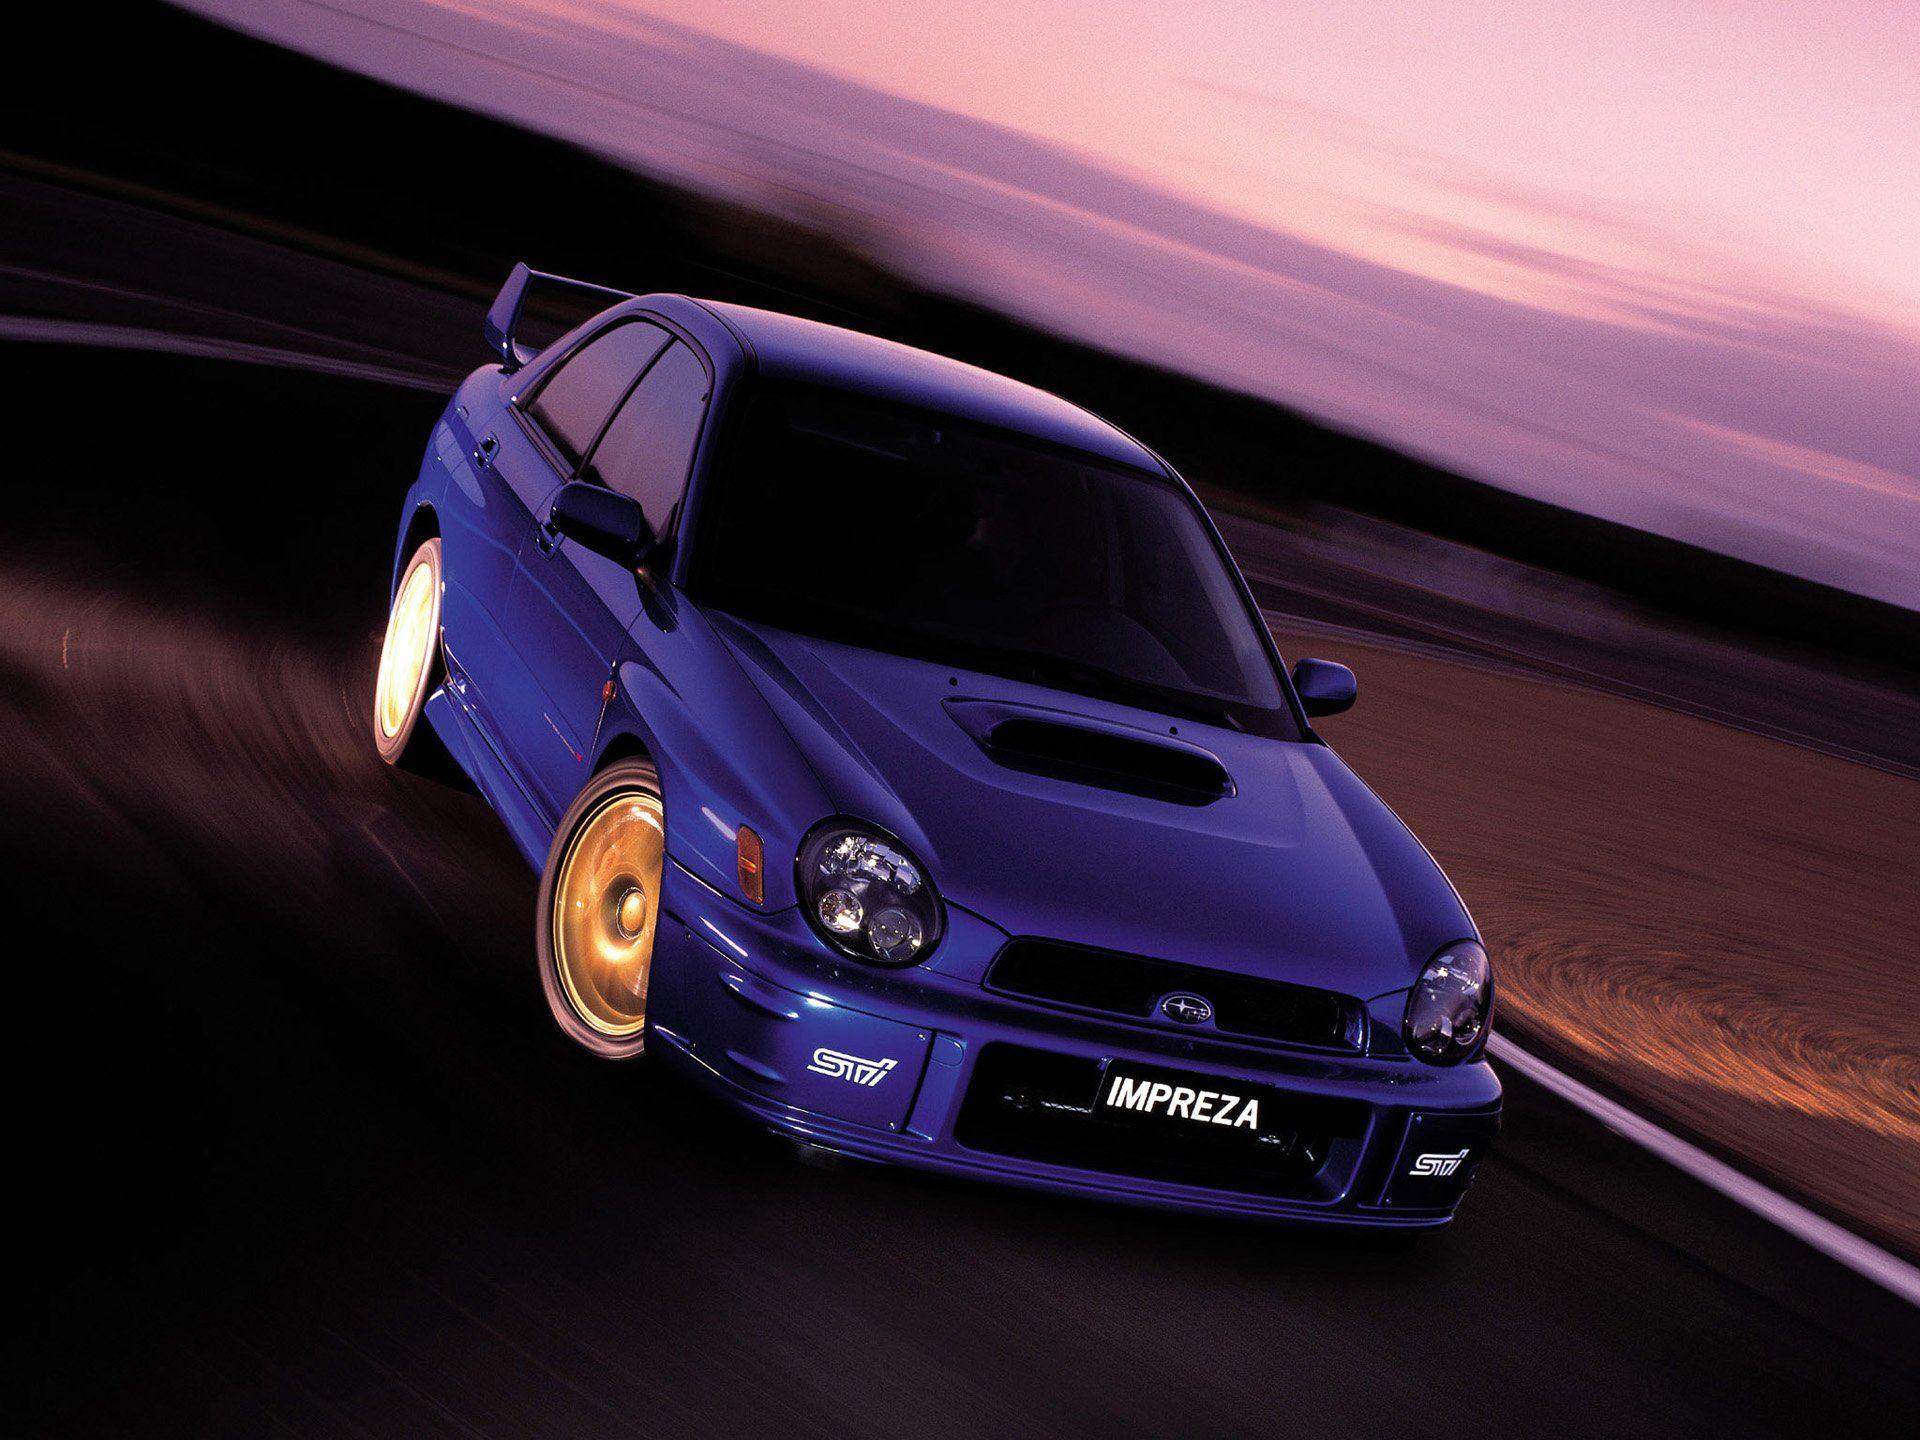 Subaru impreza wrx sti subaru impreza wrx pinterest subaru subaru impreza wrx sti vanachro Choice Image